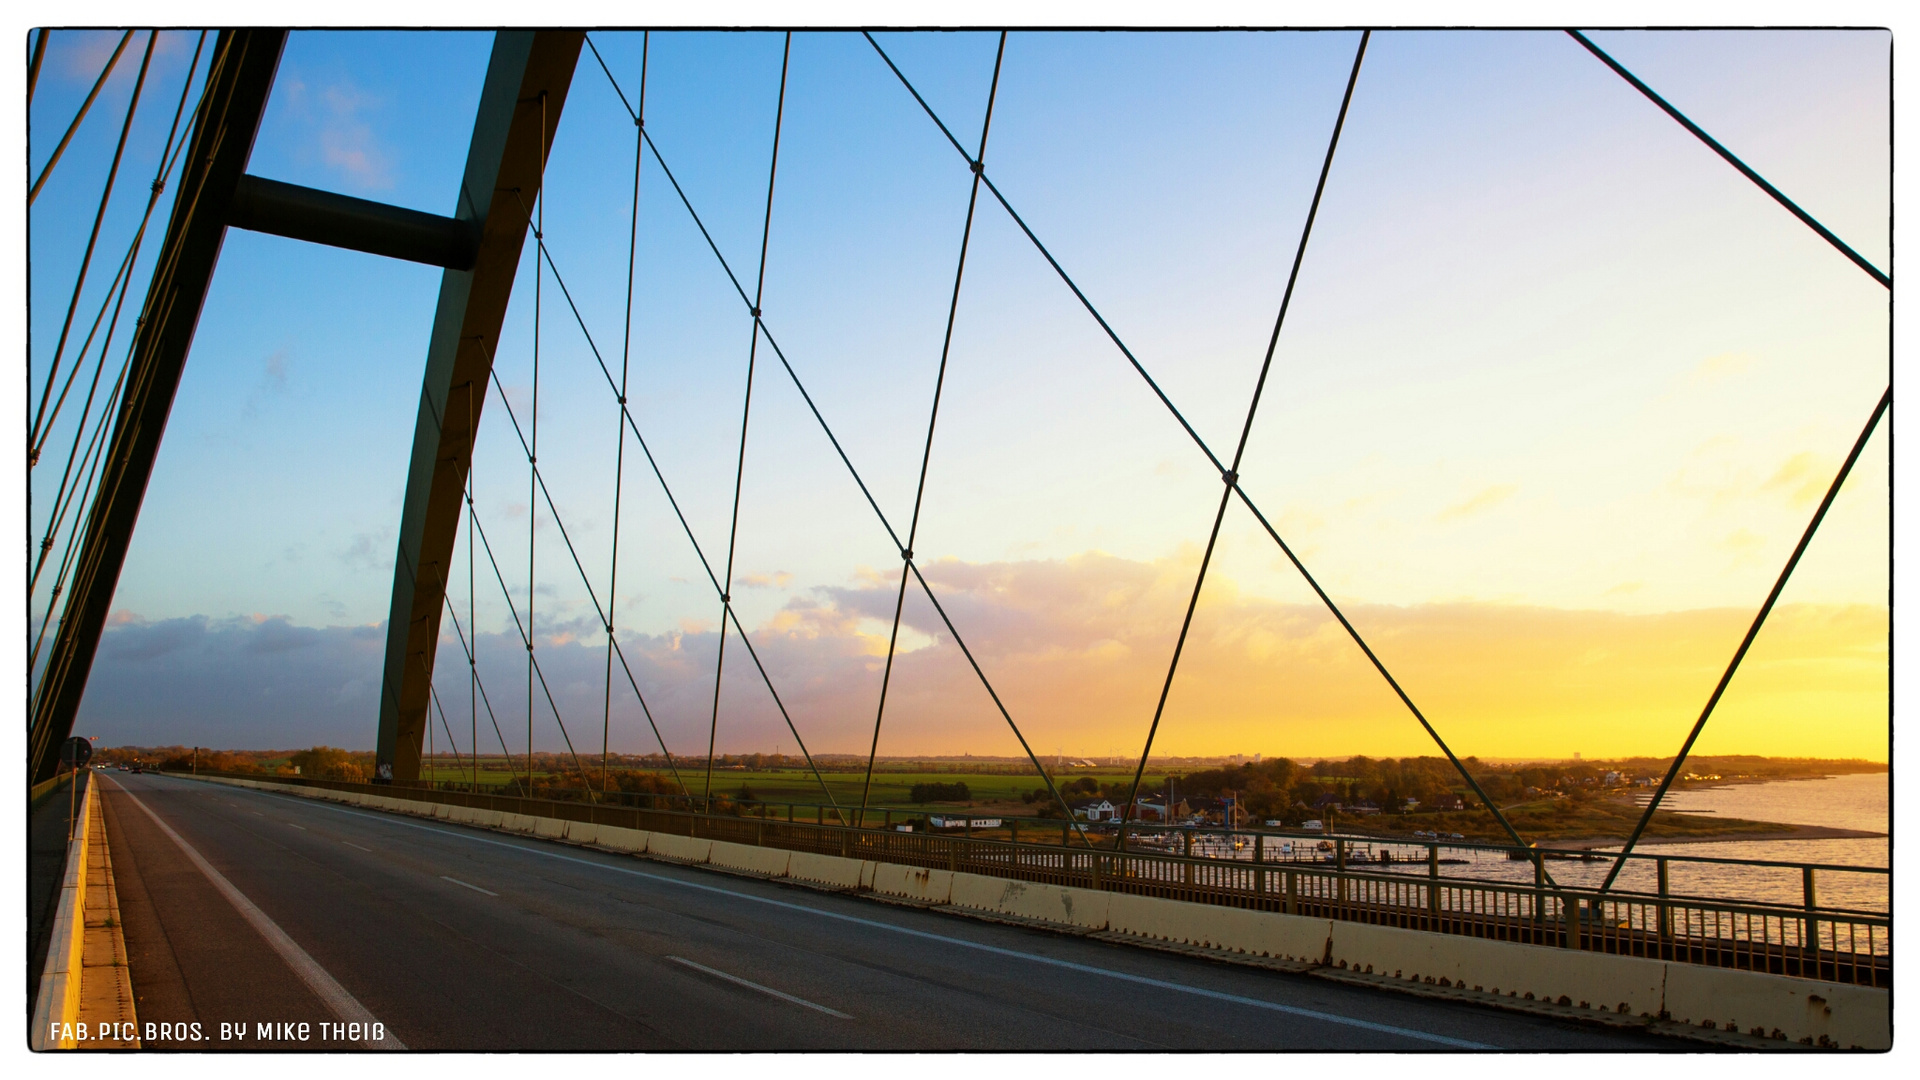 view through a bridge